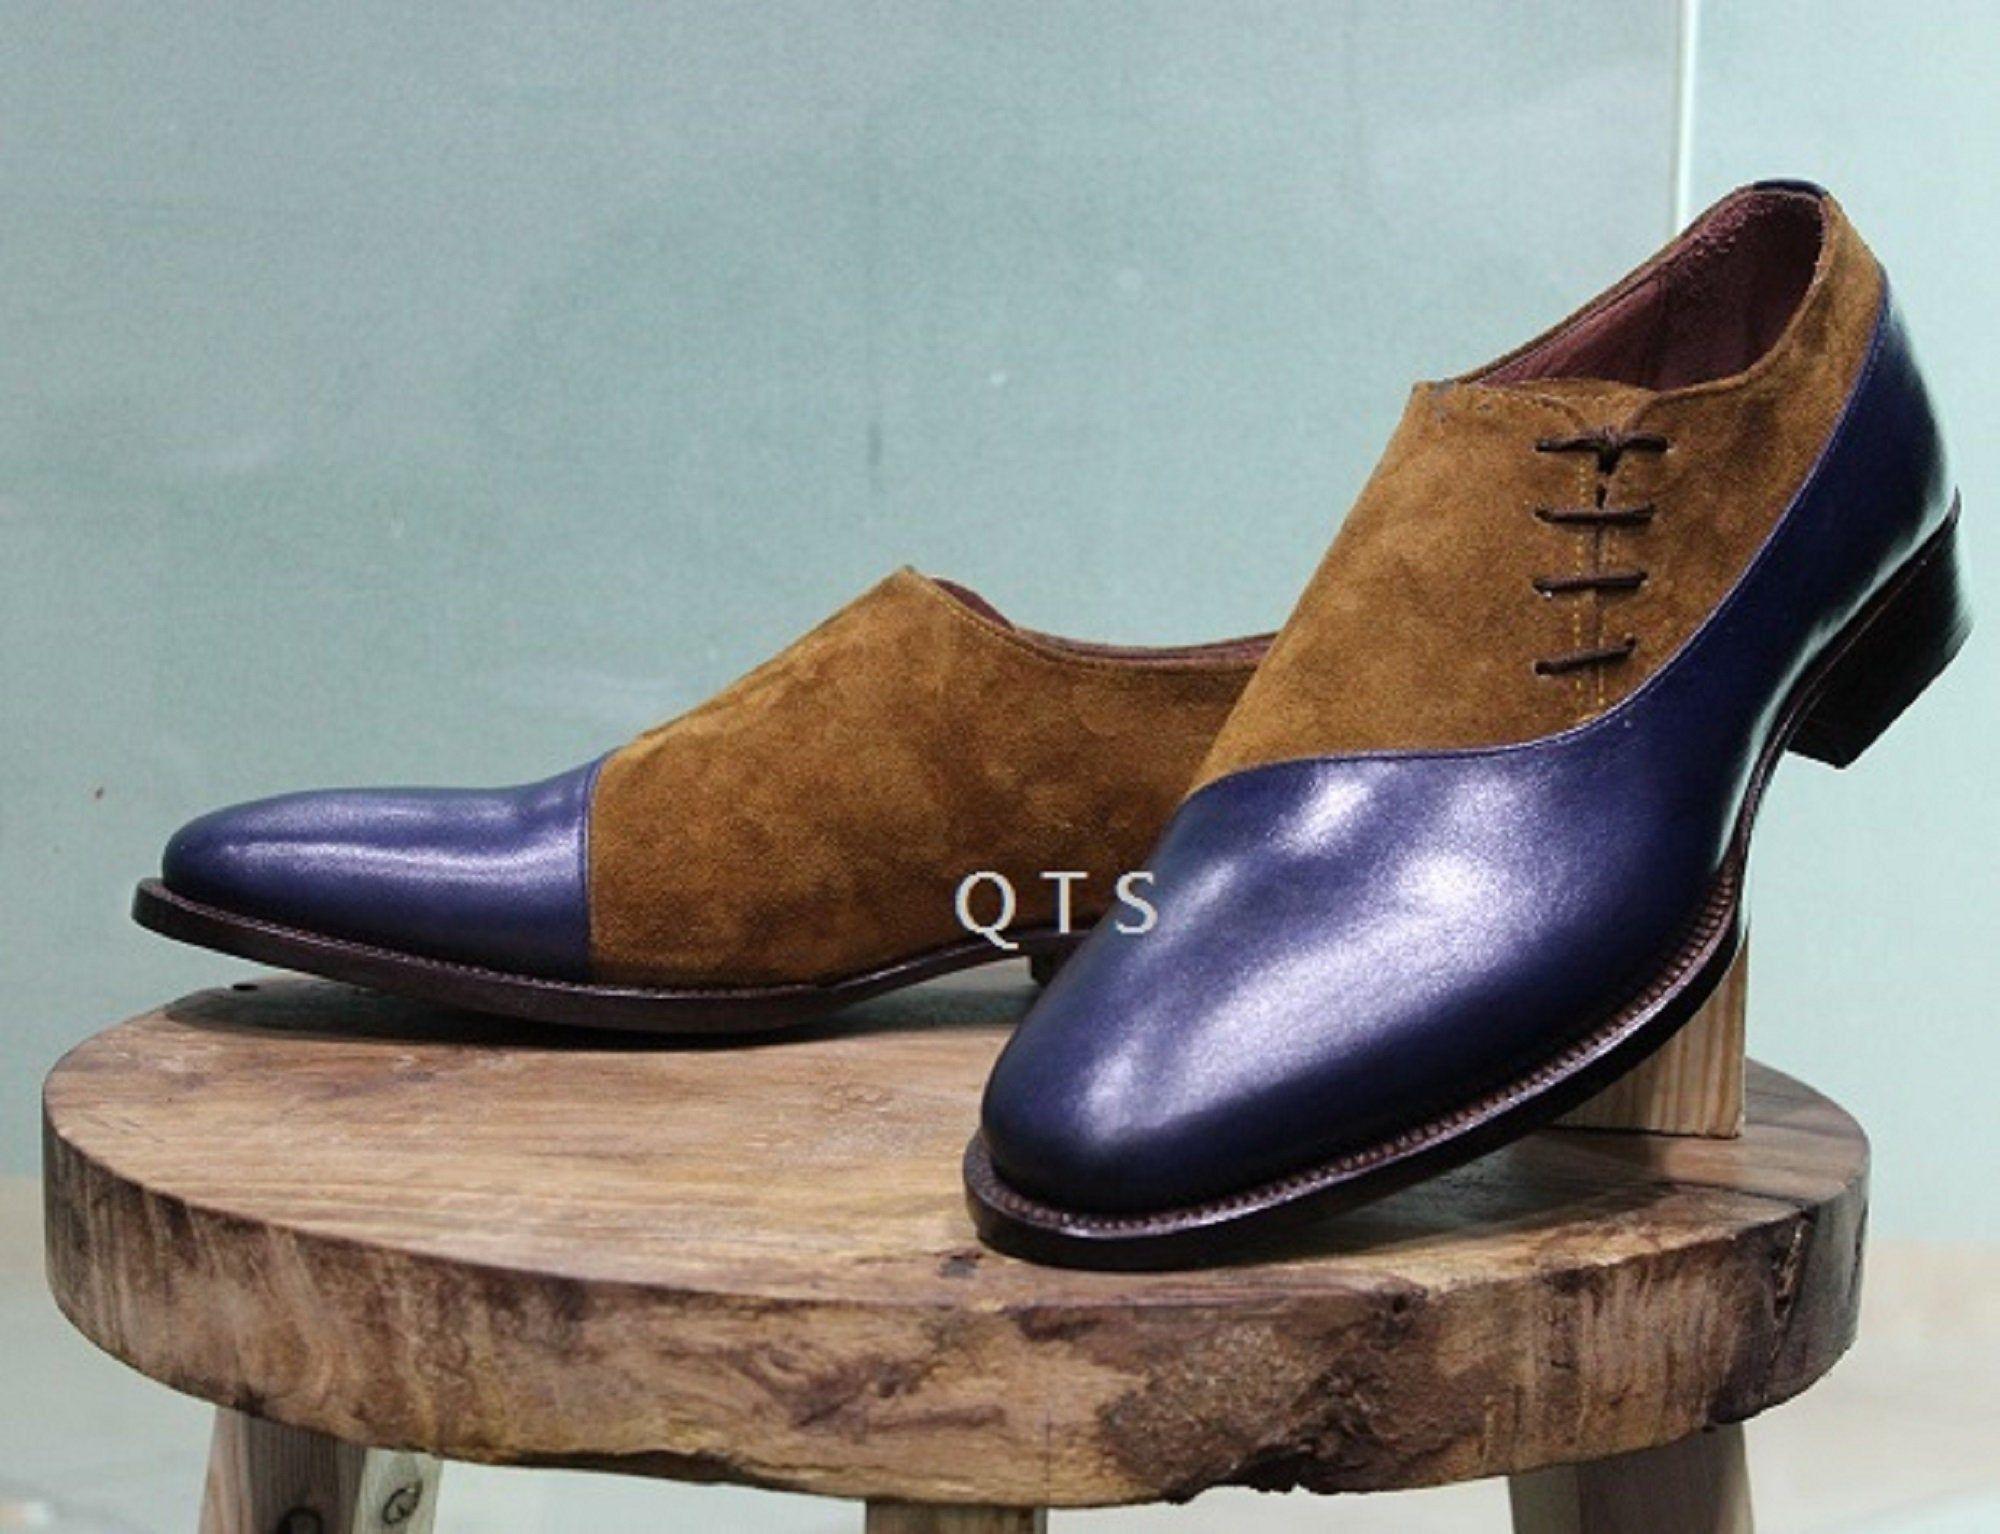 Men S New Handmade Formal Shoes Brown Suede Blue Leather Etsy In 2020 Formal Shoes Leather Shoes Men Dress Shoes Men